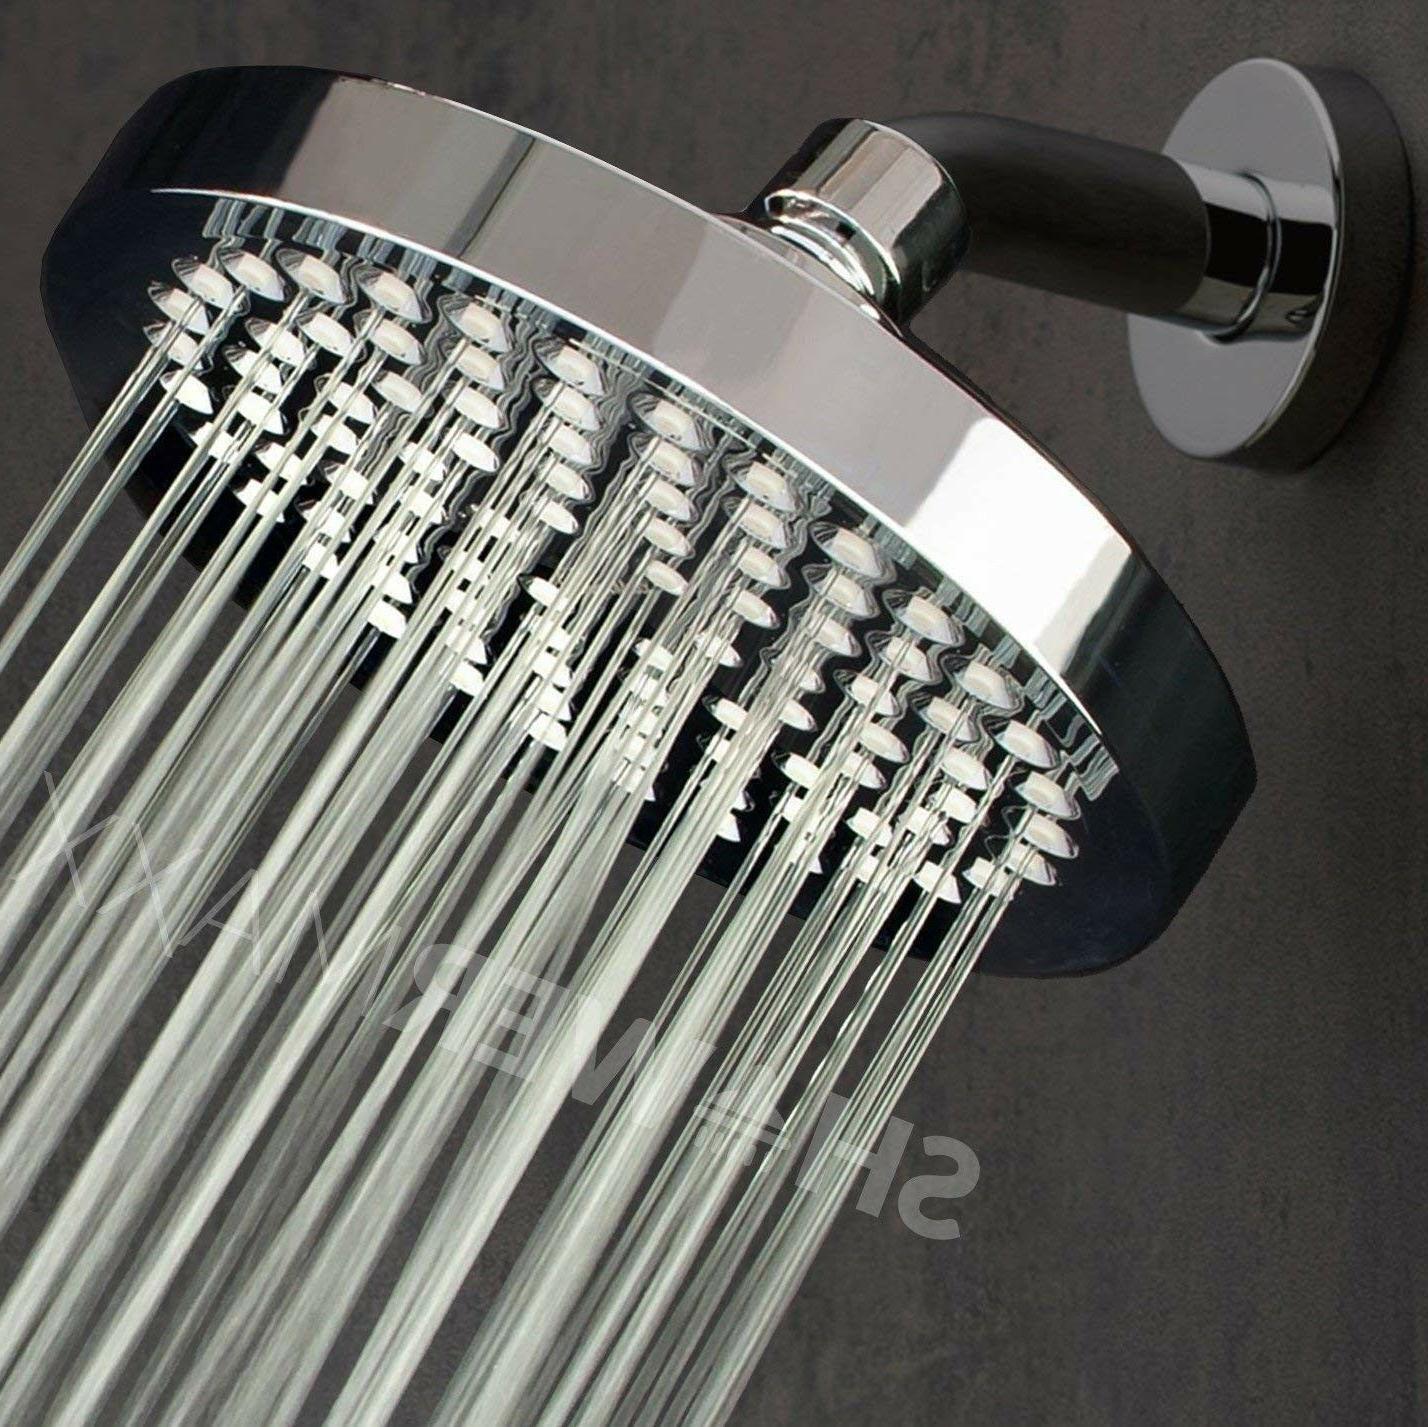 ShowerMaxx Luxury Spa6 Circular Ultra High Pressure Rain Sho